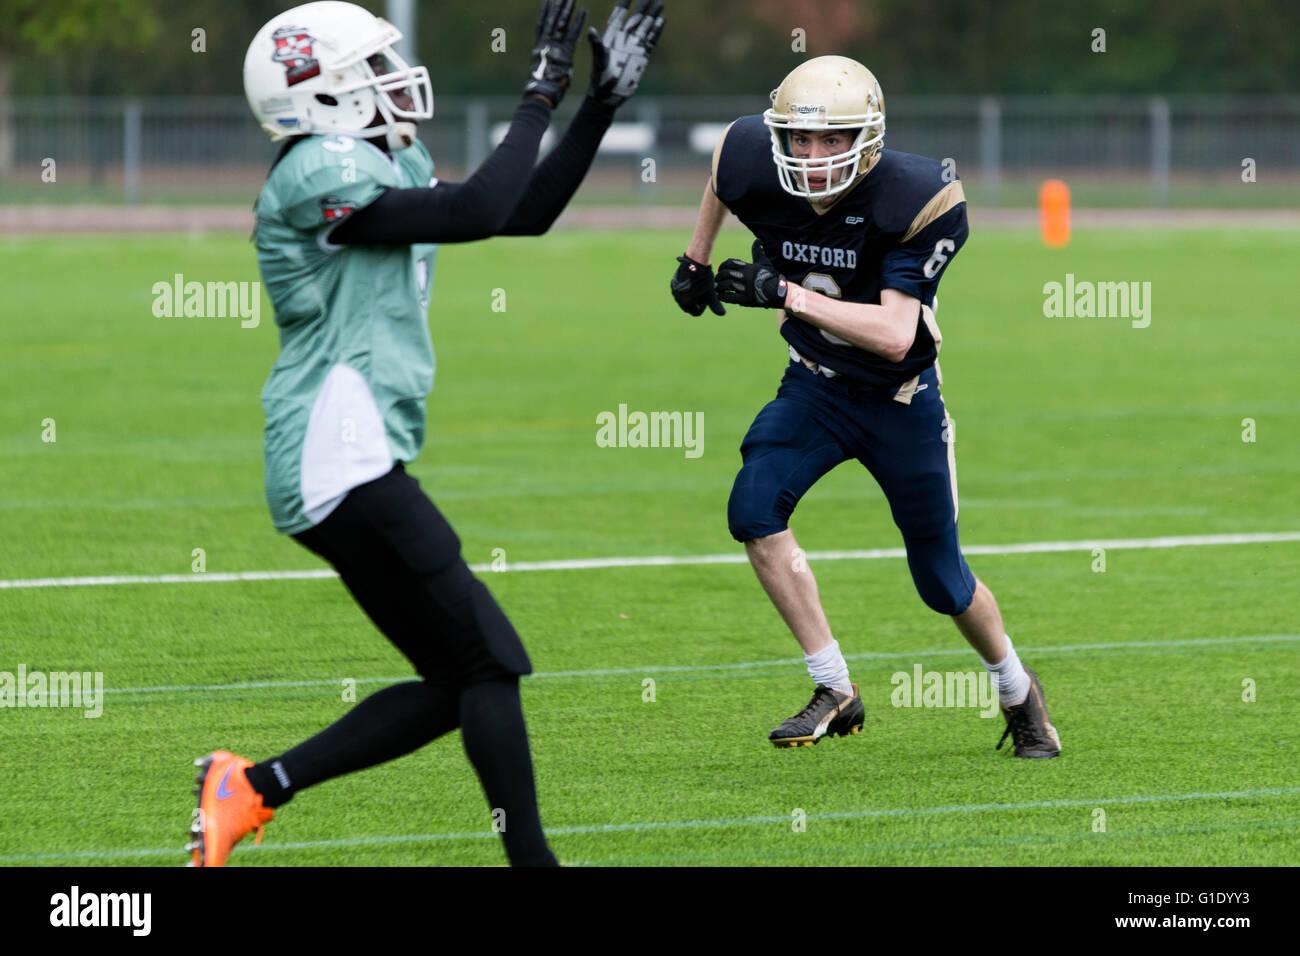 Varsity Bowl X Oxford University AFC vs Cambridge AFC - Stock Image